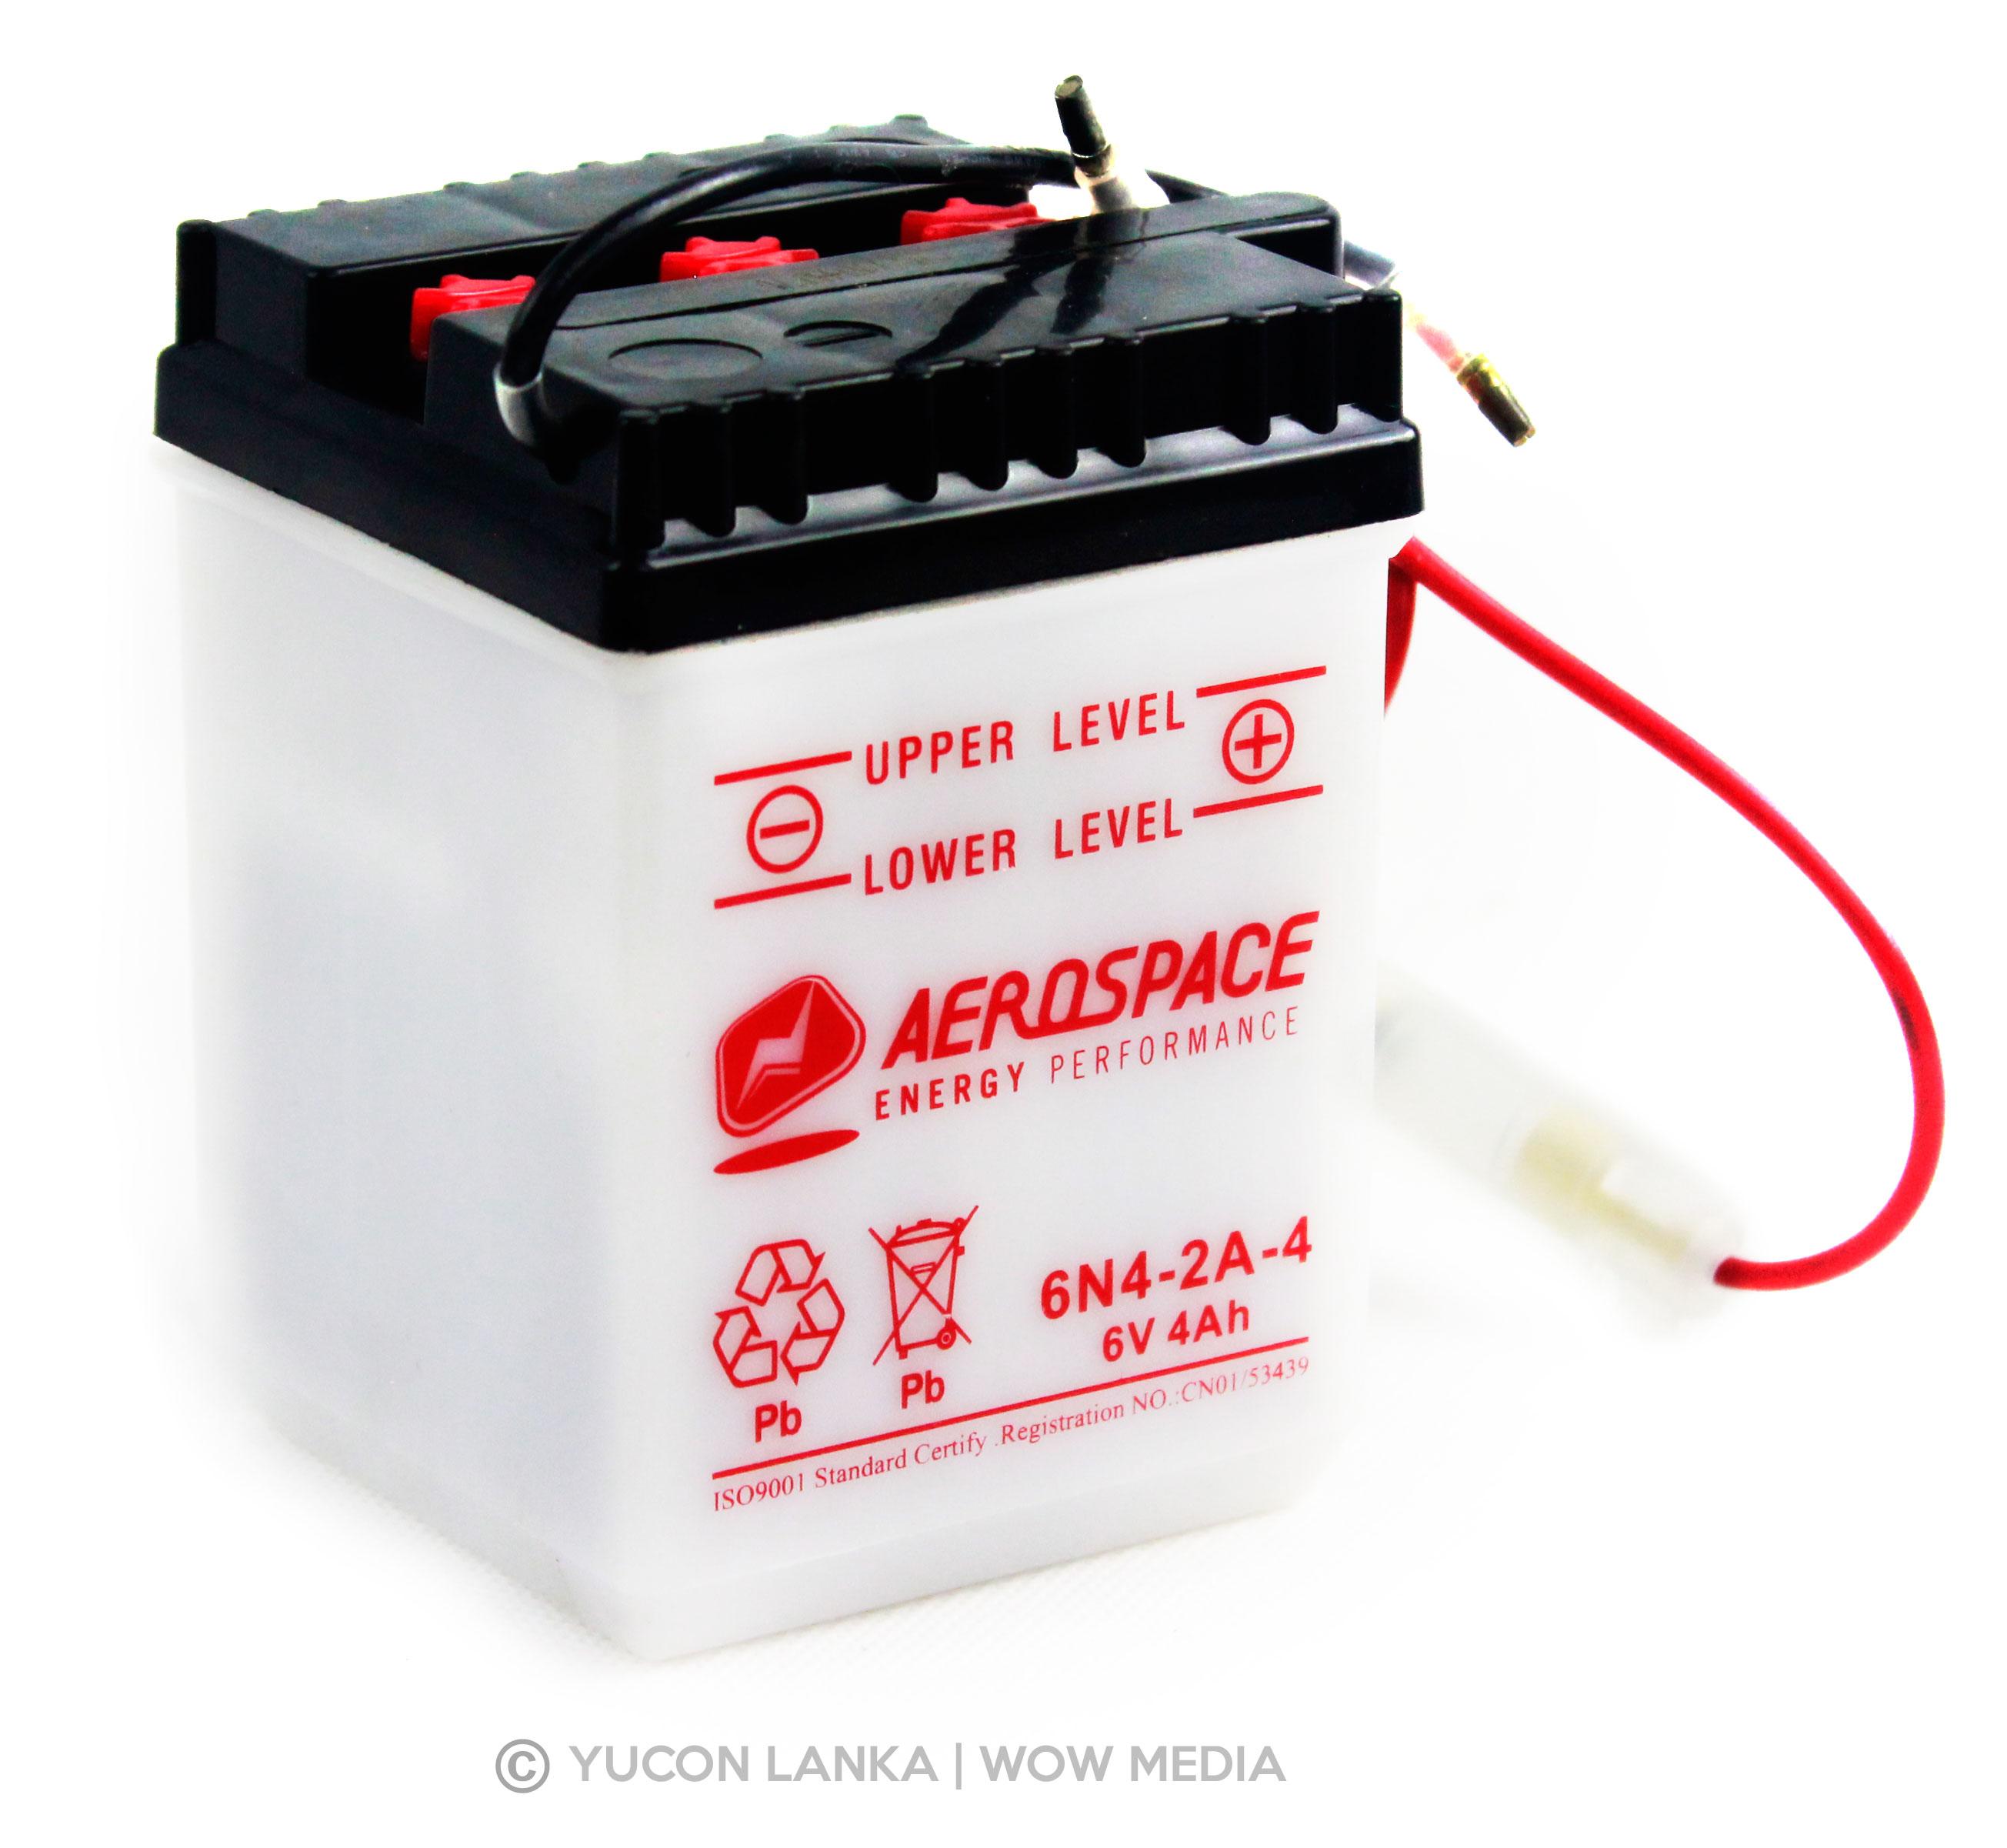 Yucon Lanka | Battery Importer & Distributor Sri Lanka